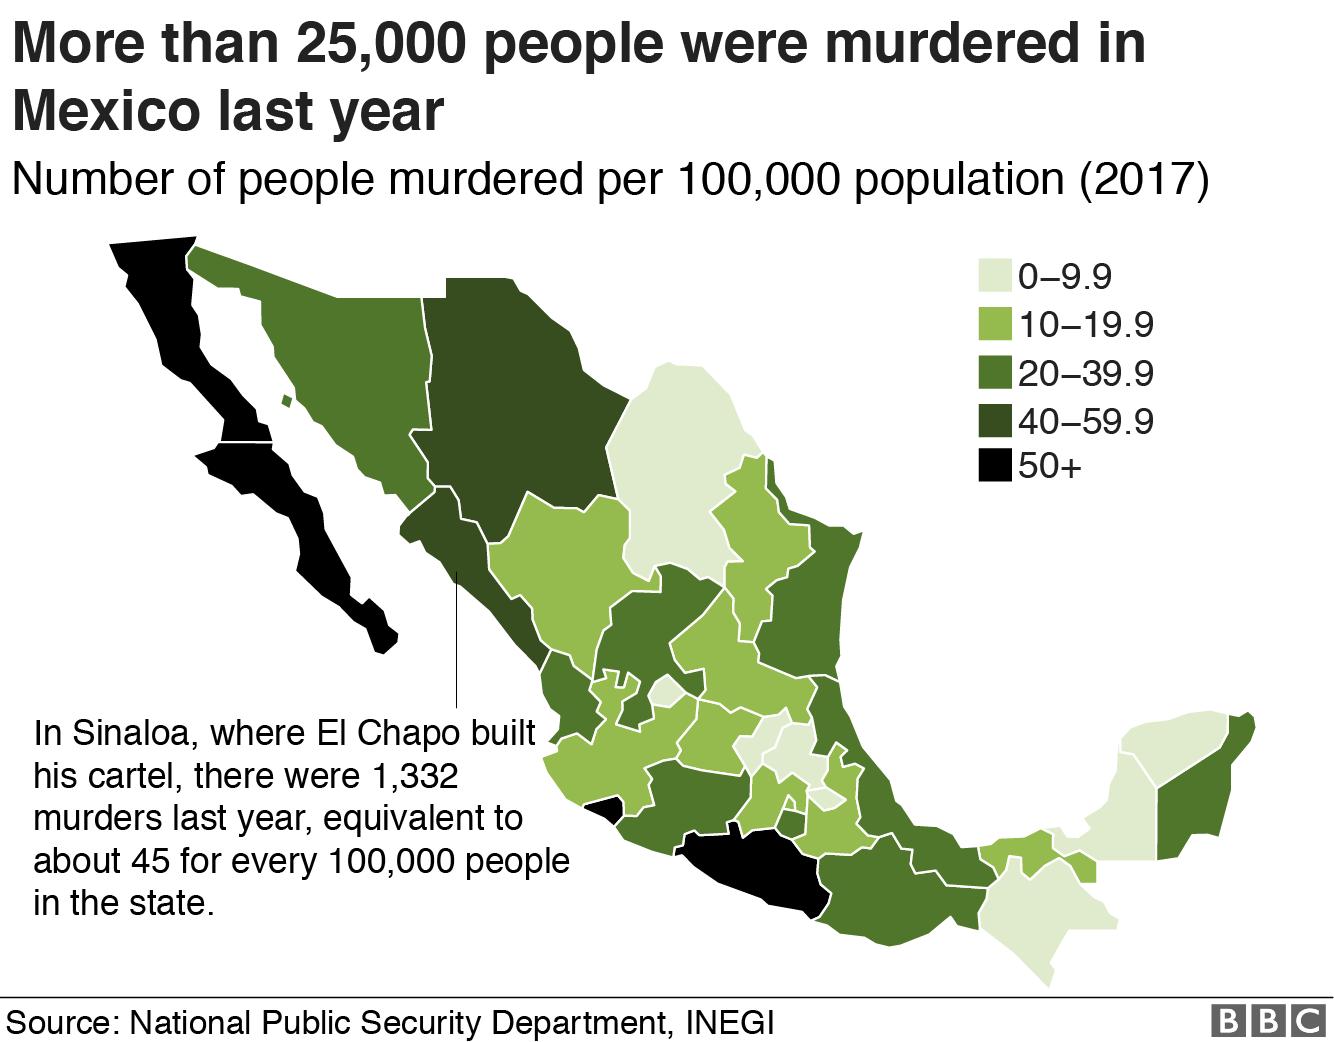 Map of murders